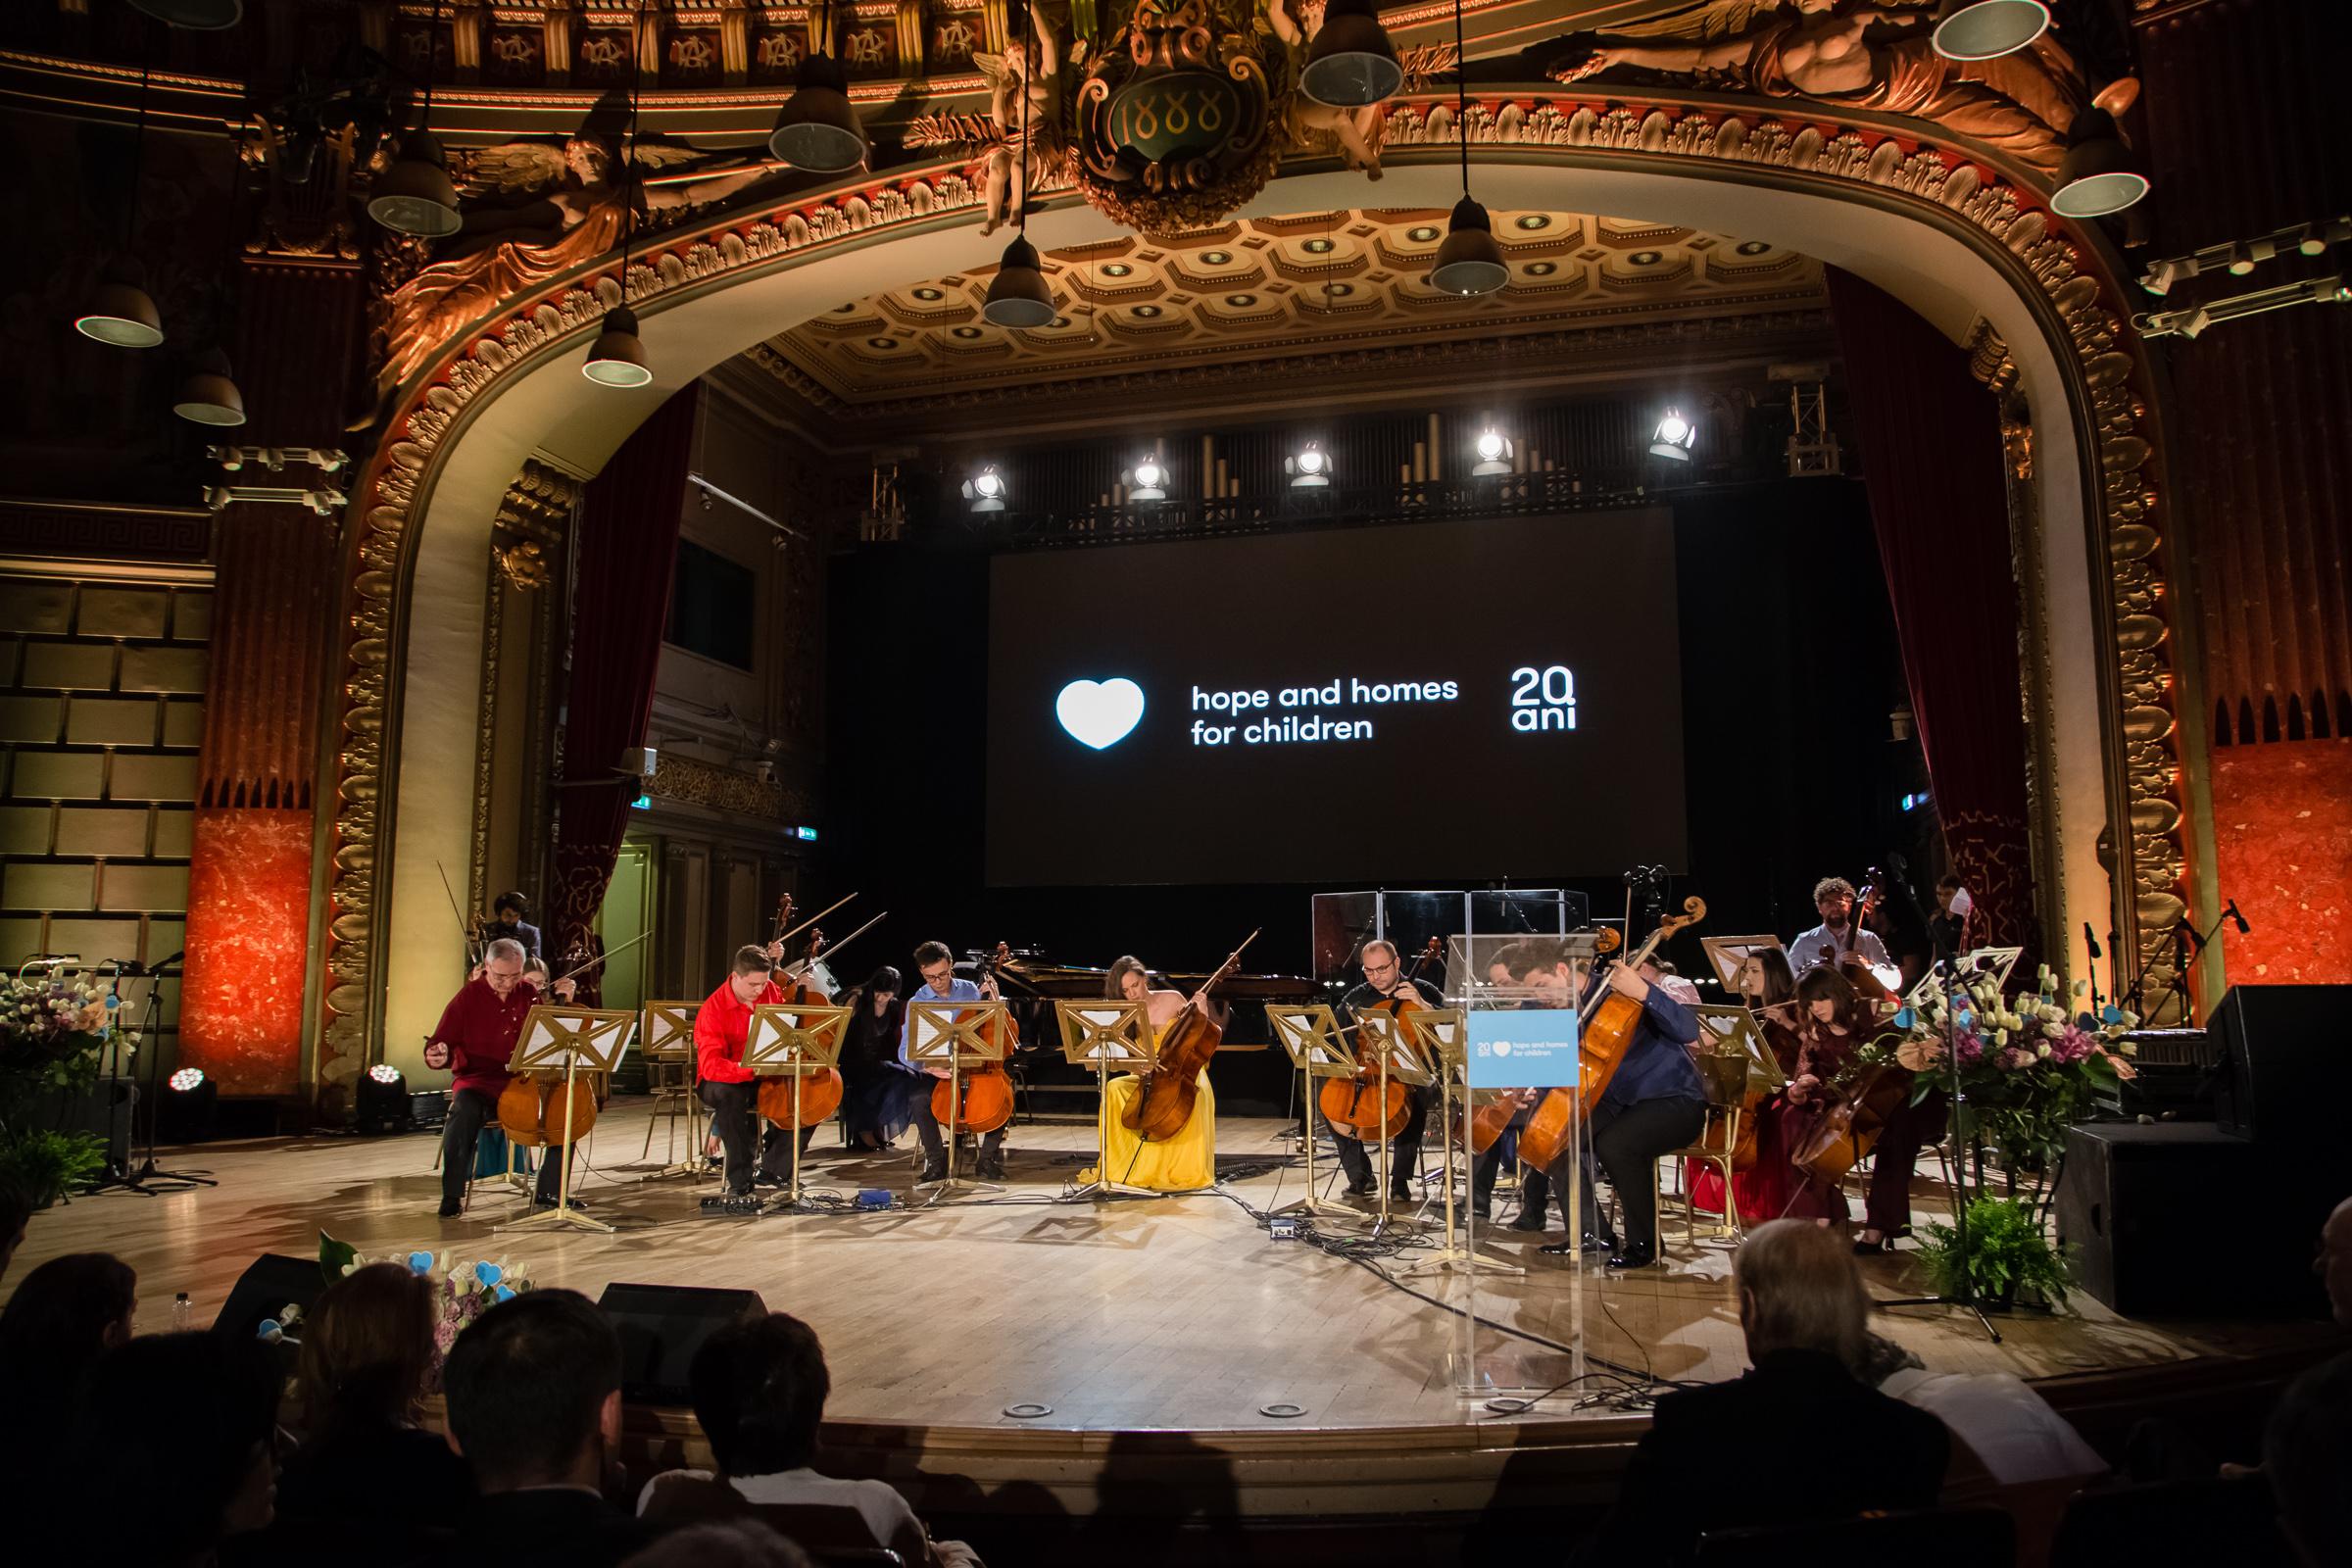 Ansamblul Violoncellissimo_Hope Concert 2018_Foto Mihnea Ciulei.jpg